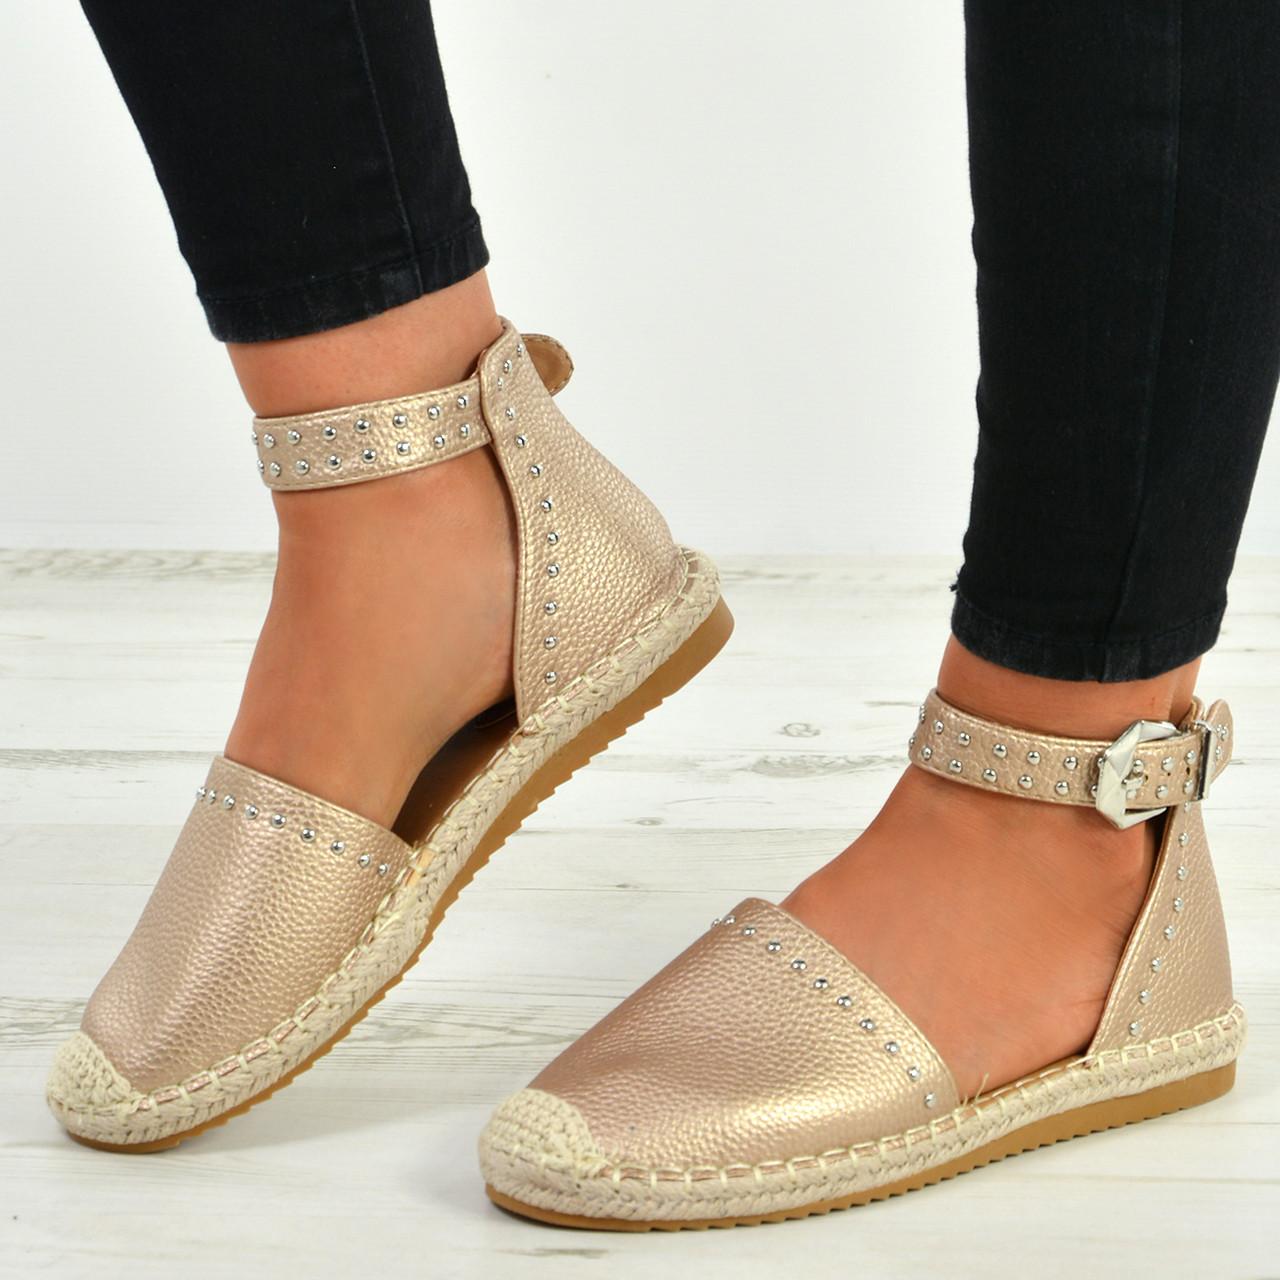 Womens Ladies Flat Heel Stud Summer Espadrilles Ankle Strap Sandals Shoes Size 7